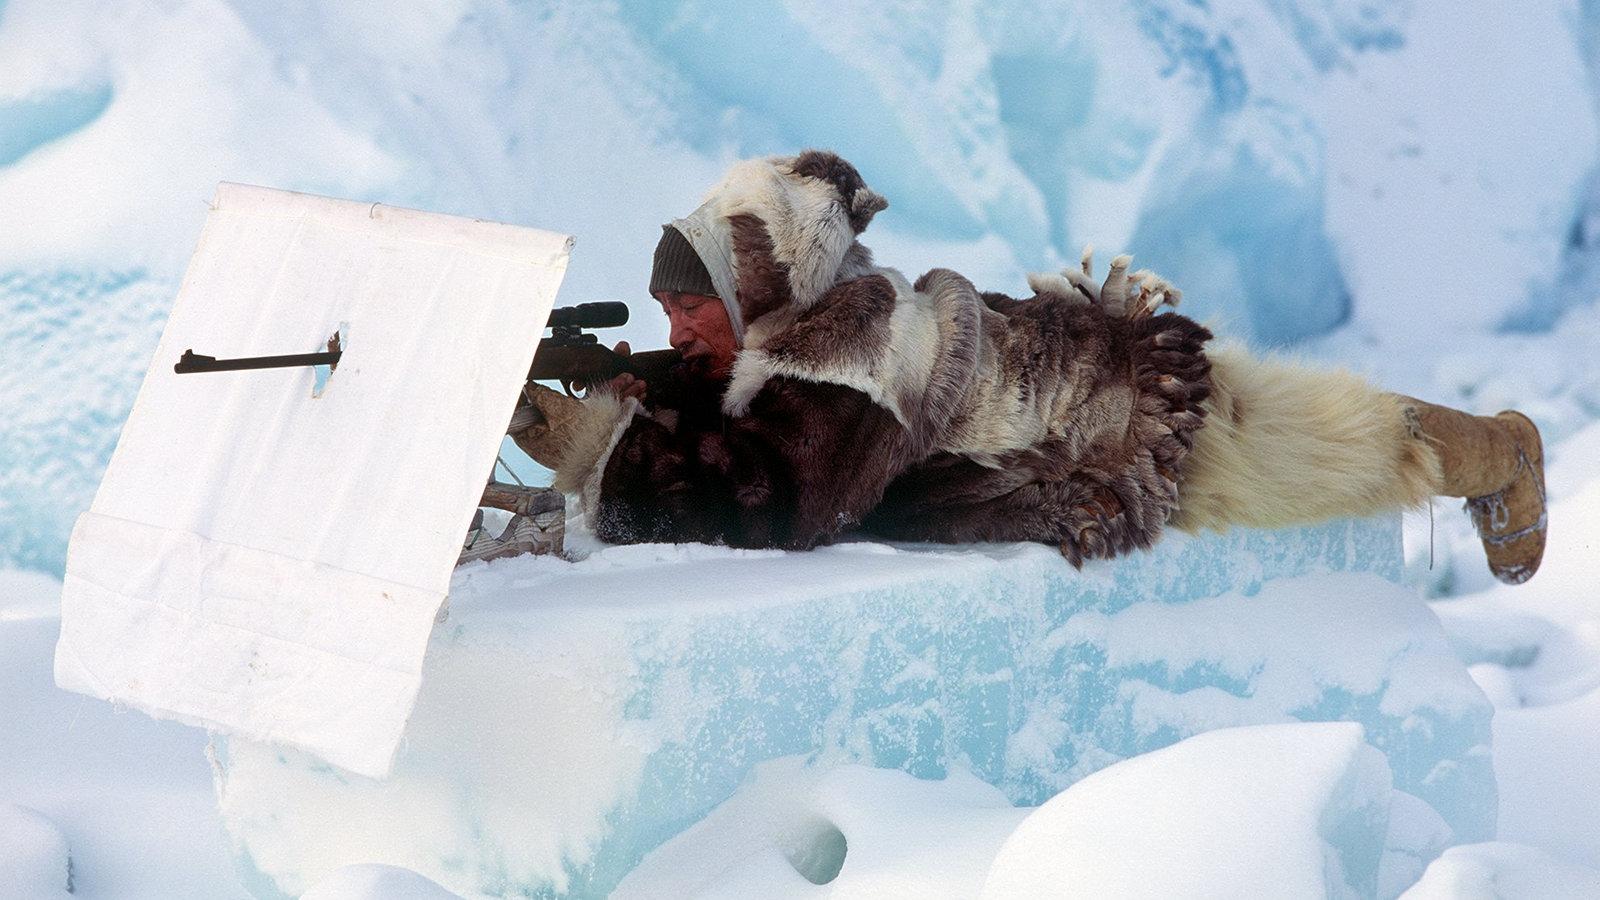 arktis berlebensstrategien polarregionen natur planet wissen. Black Bedroom Furniture Sets. Home Design Ideas